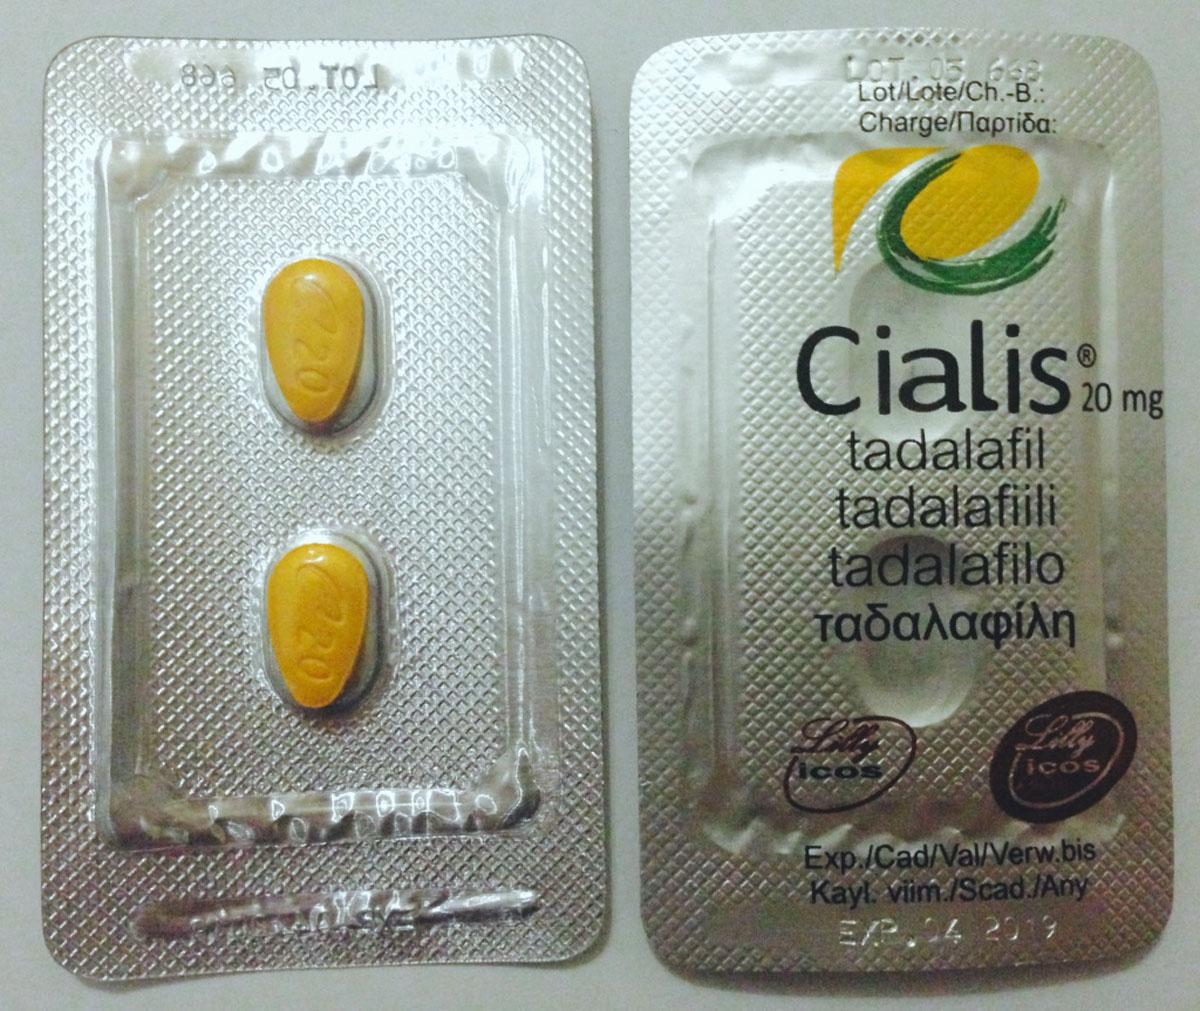 Pode se comprar cialis sem receita medica